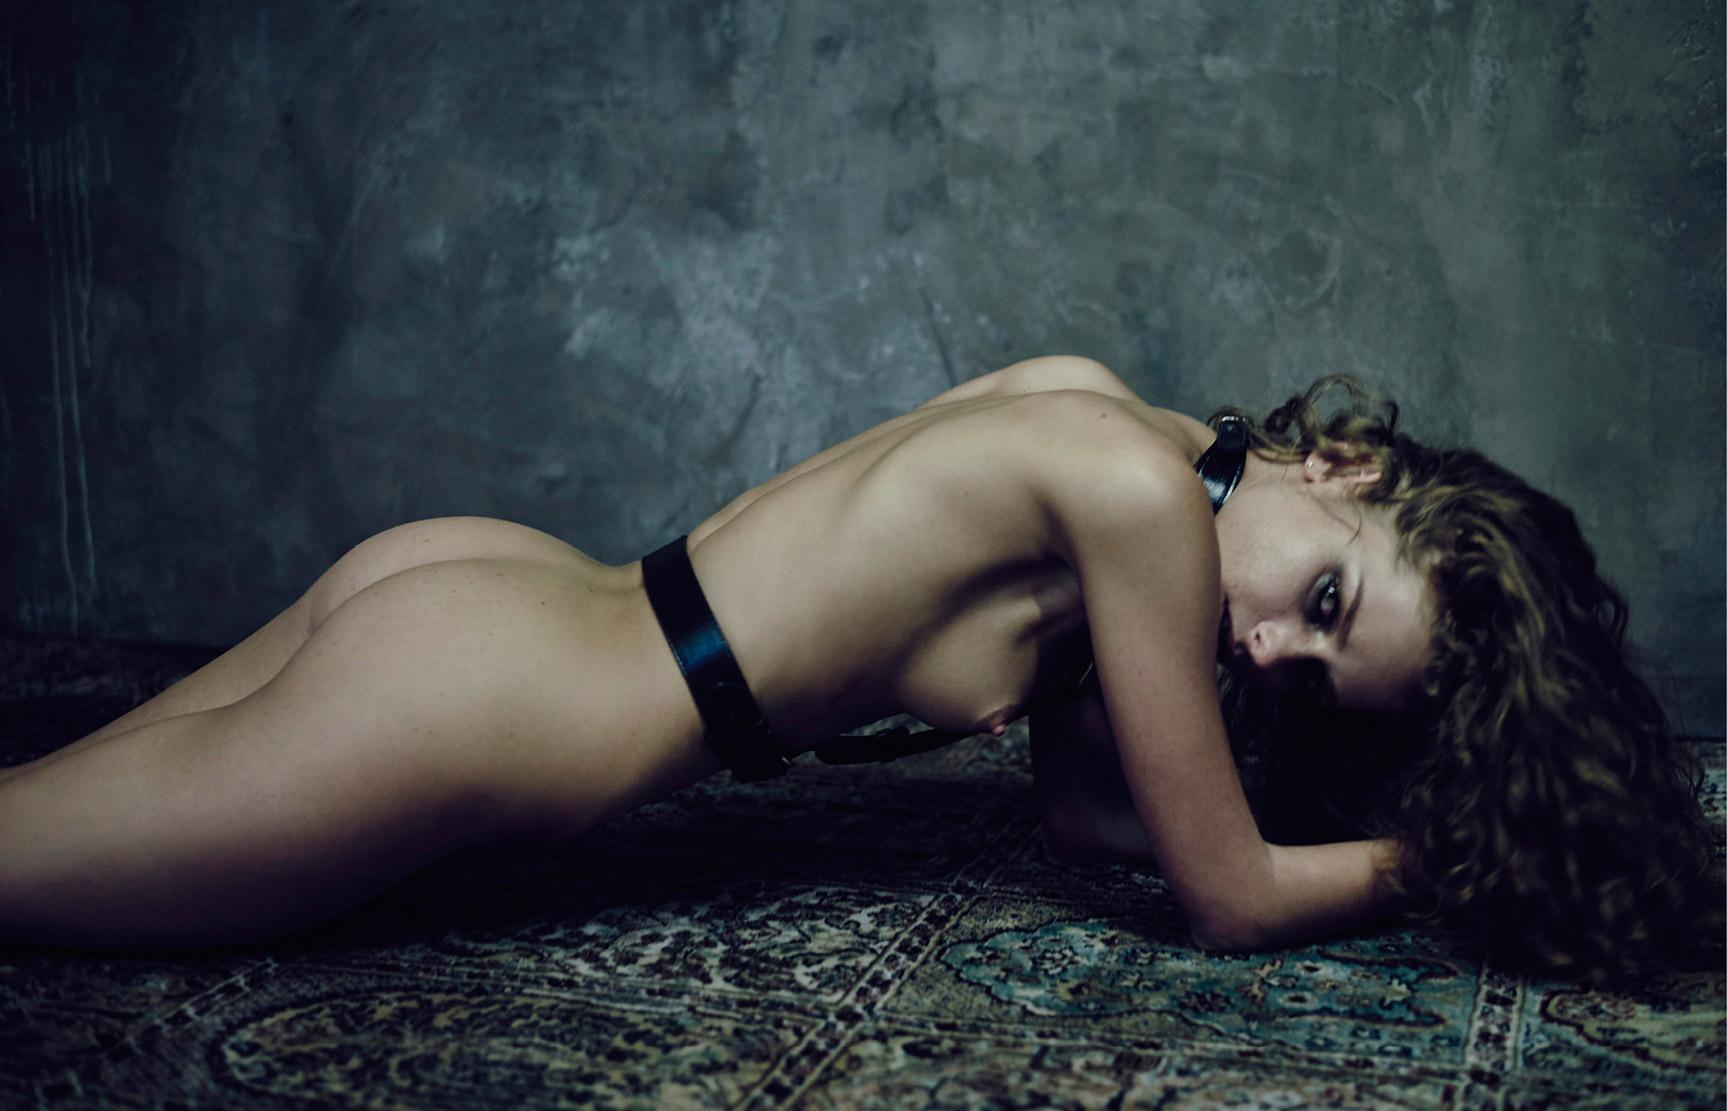 Юлия Ярошенко / Julia Yaroshenko by Nicolas Guerin - P magazine